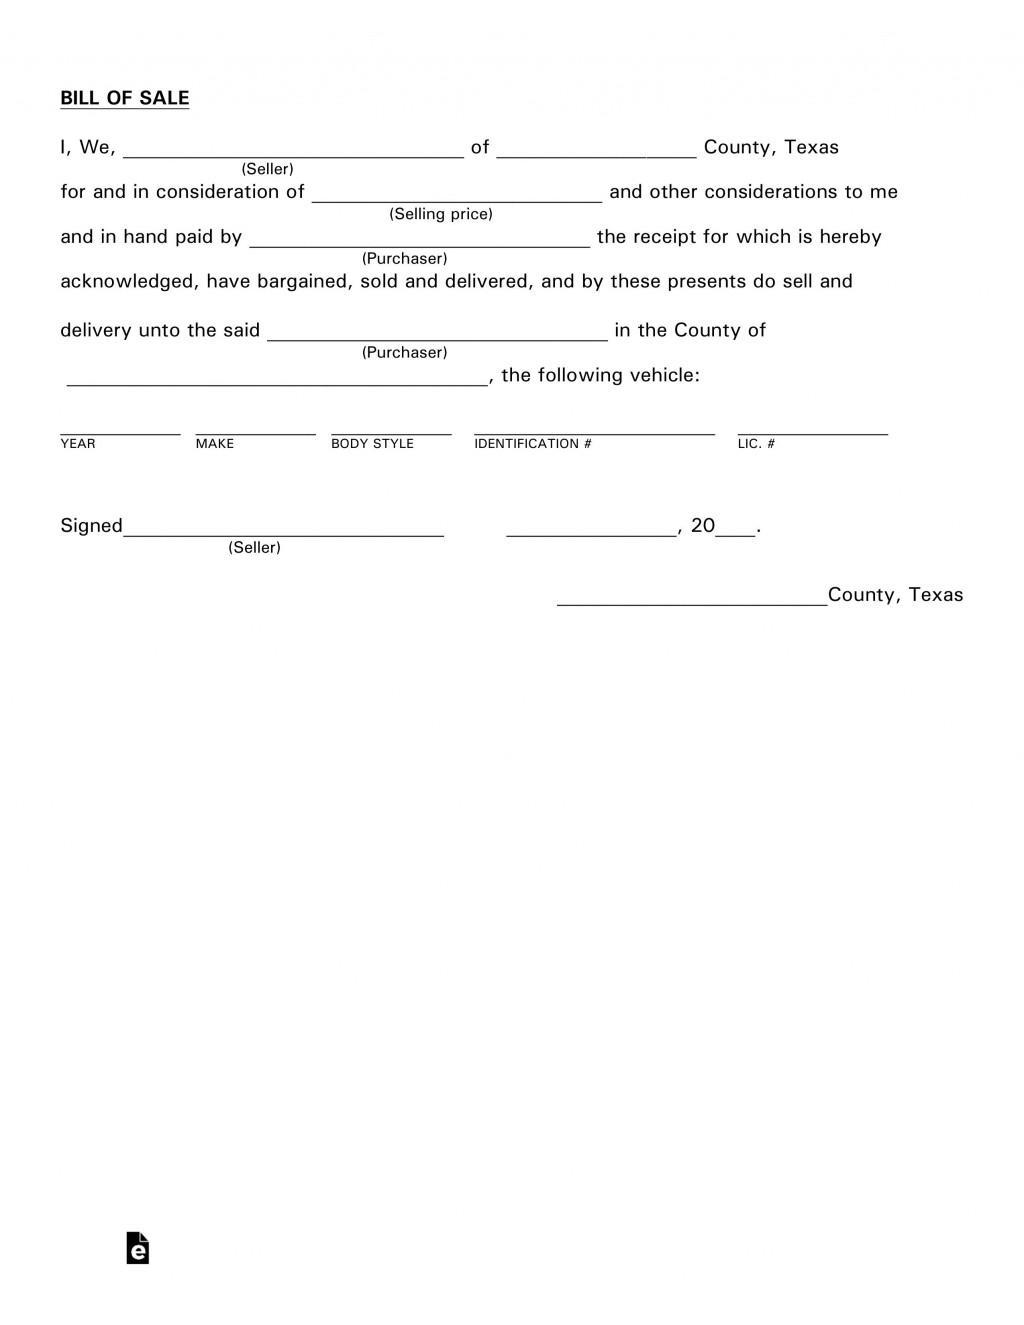 007 Imposing Bill Of Sale Template Texa Concept  Texas Free Car Form Dmv DocumentLarge